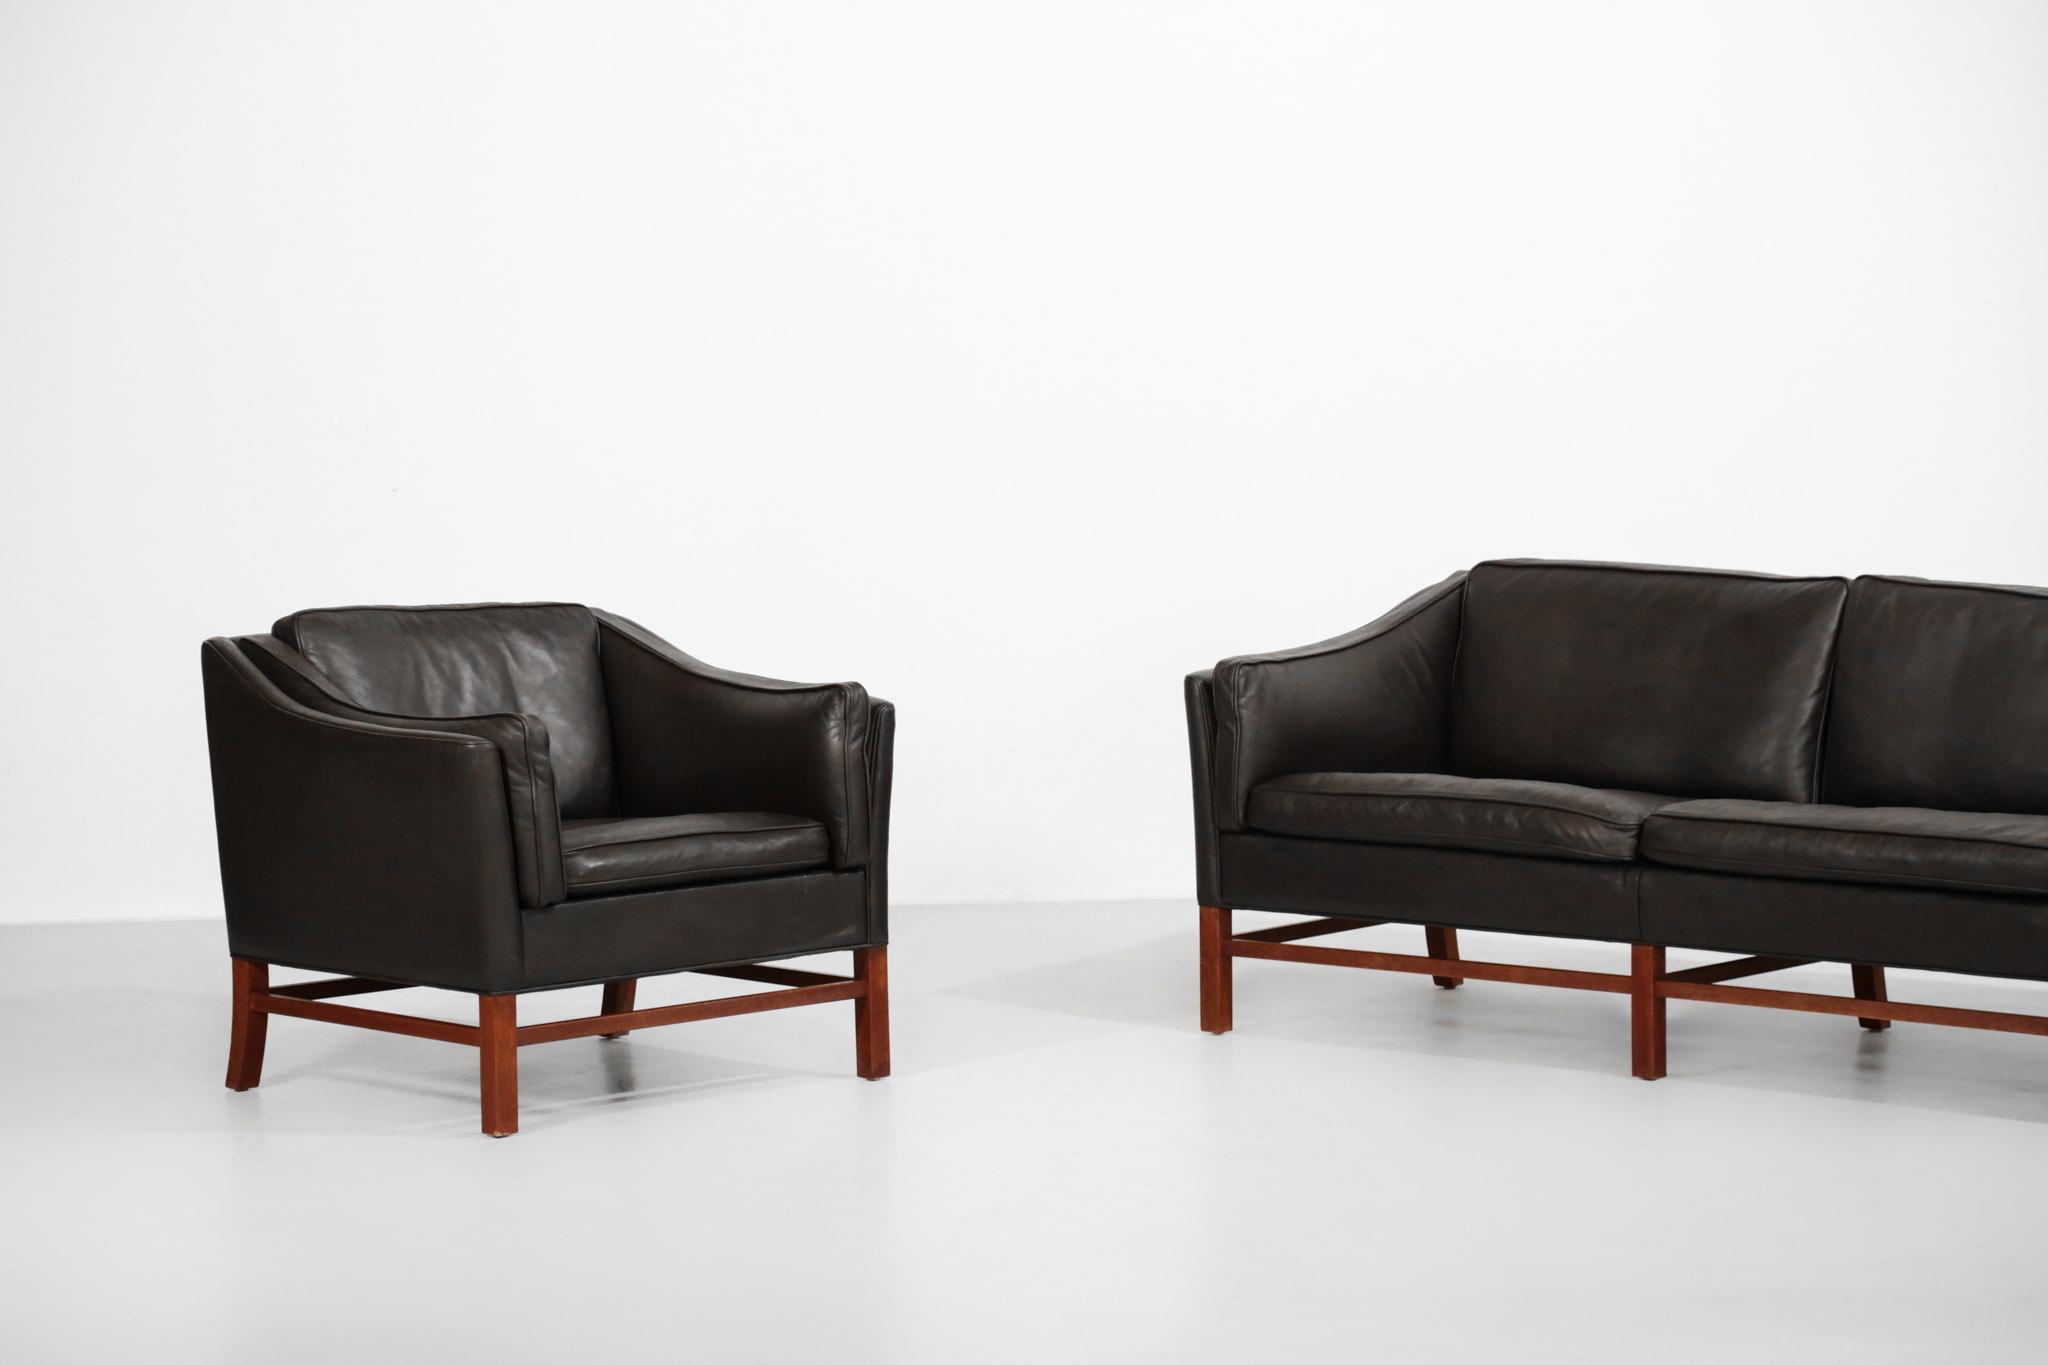 Salon danois fauteuil et canapé sofa scandinave cuir